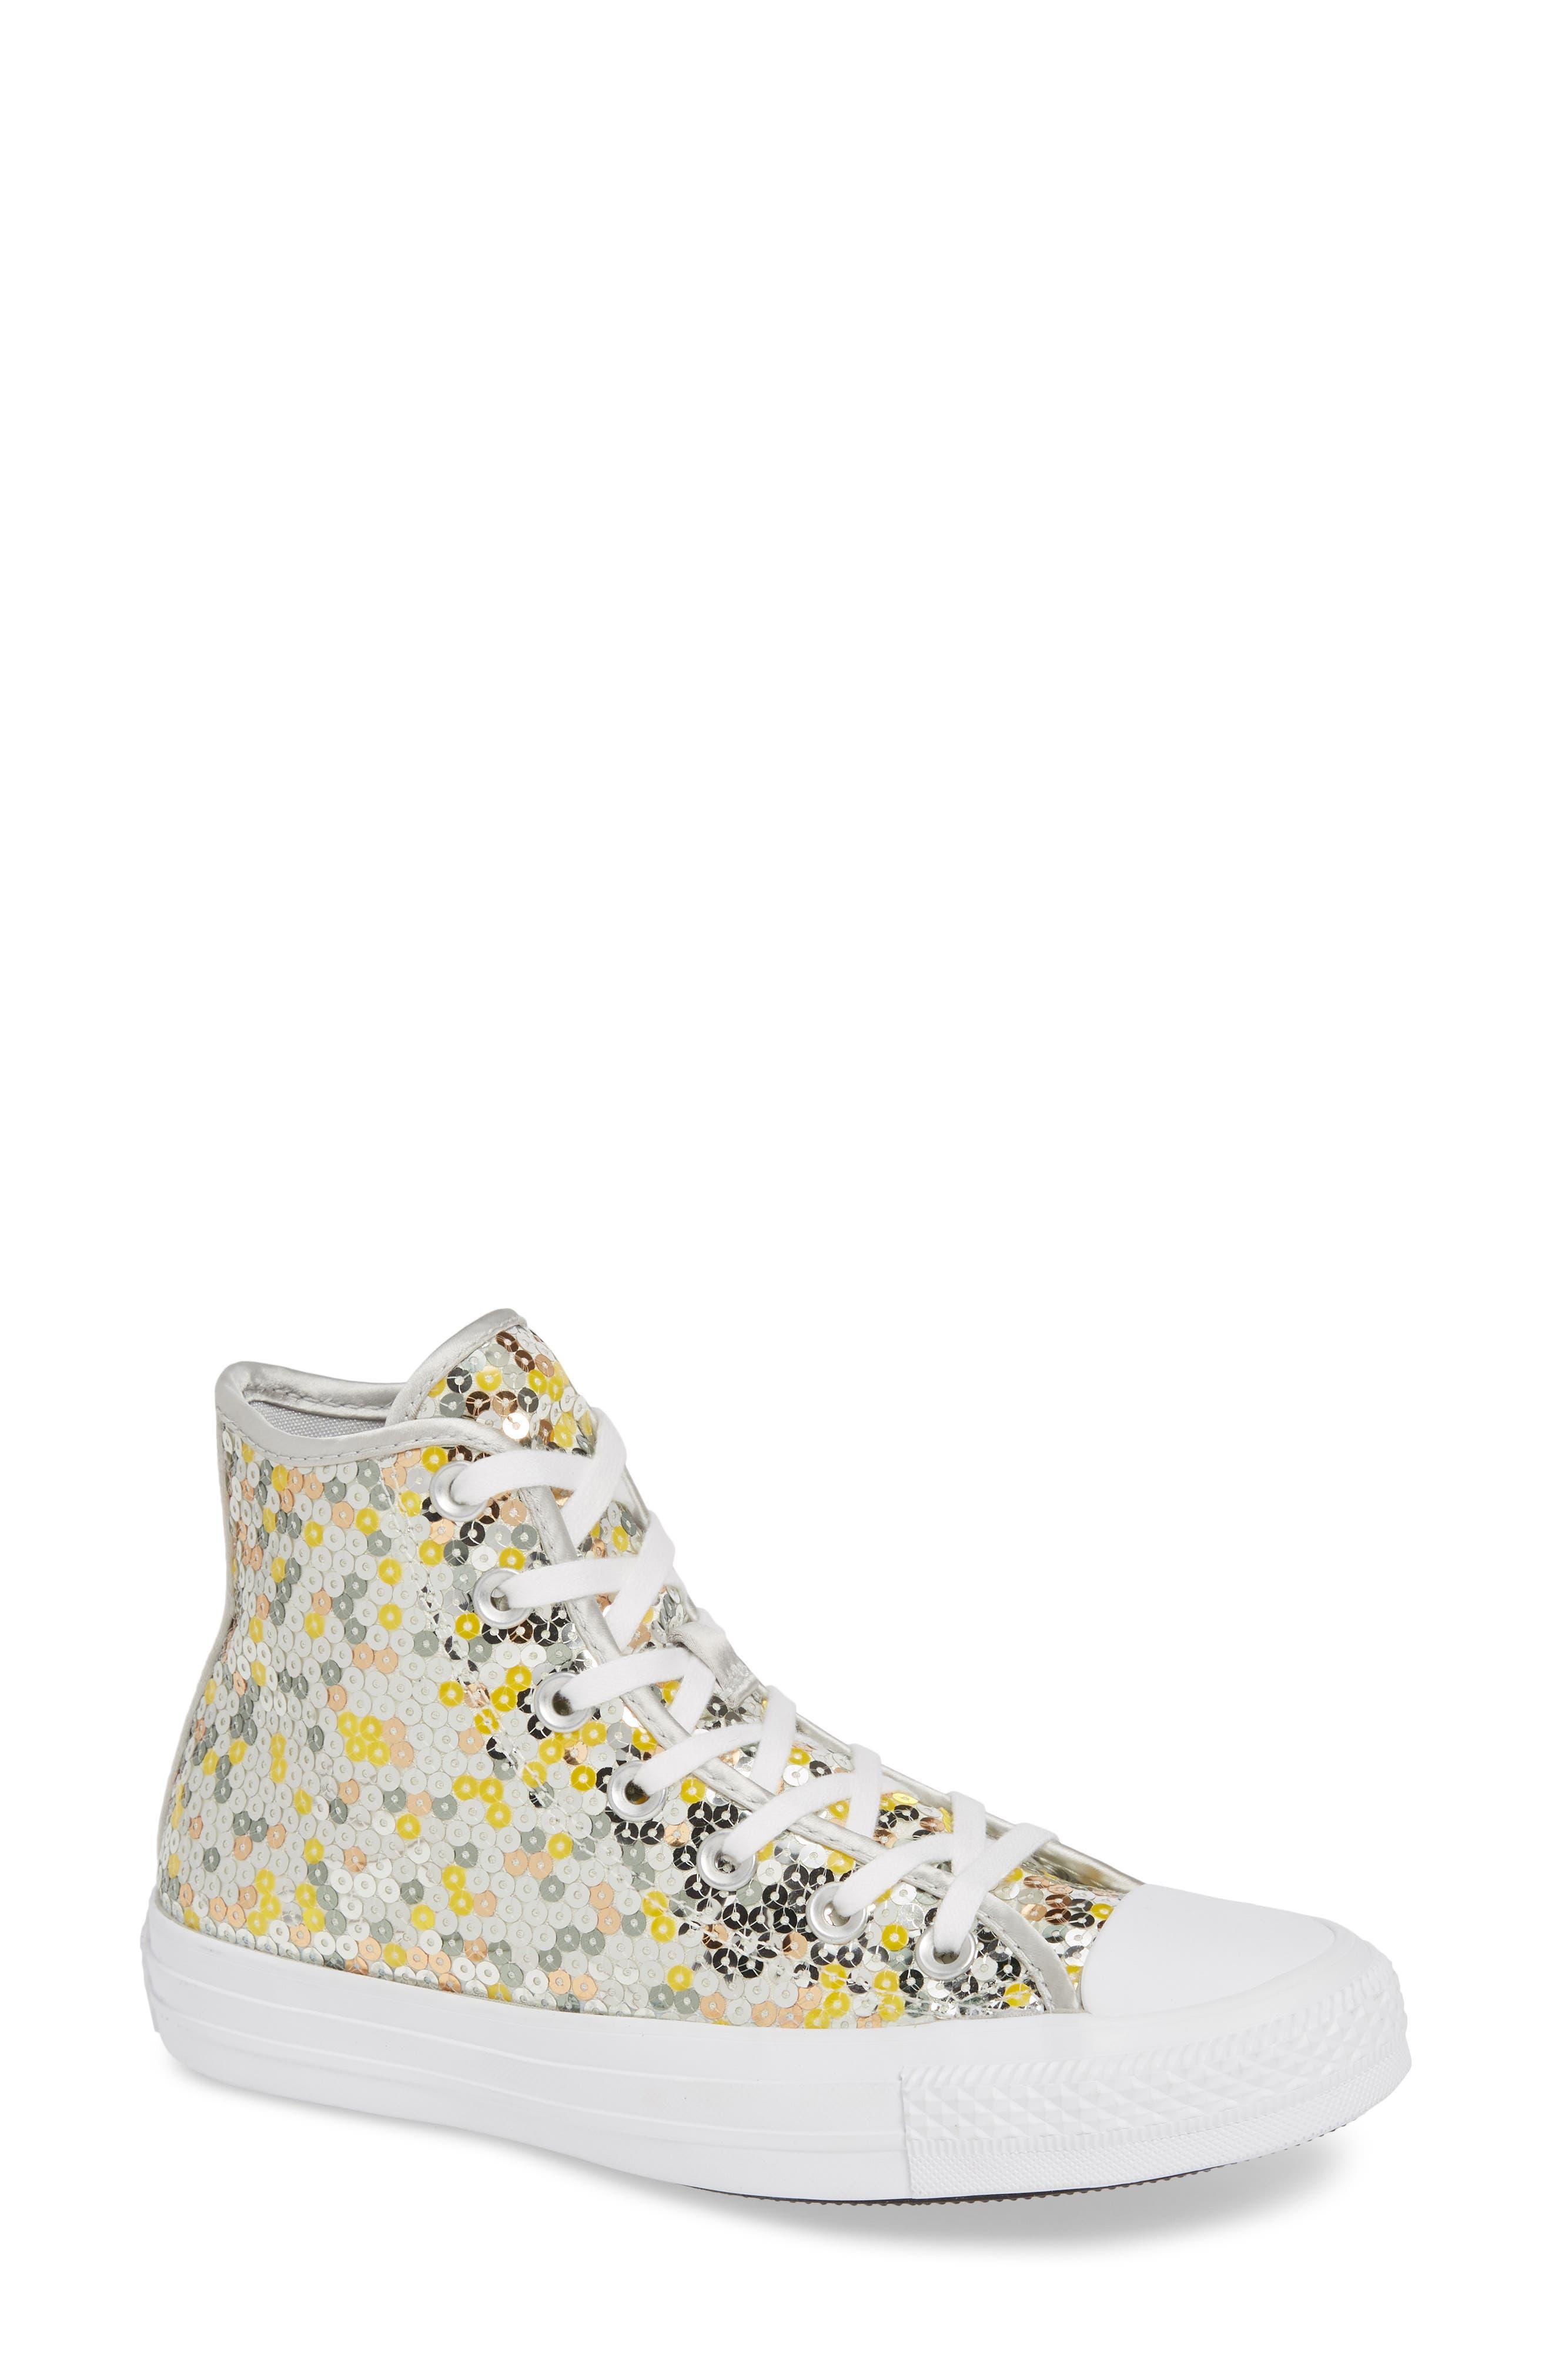 b0ce582f6e6c 579d2 79b99  amazon converse chuck taylor all star sequin high top sneaker  women bfe84 94b7f